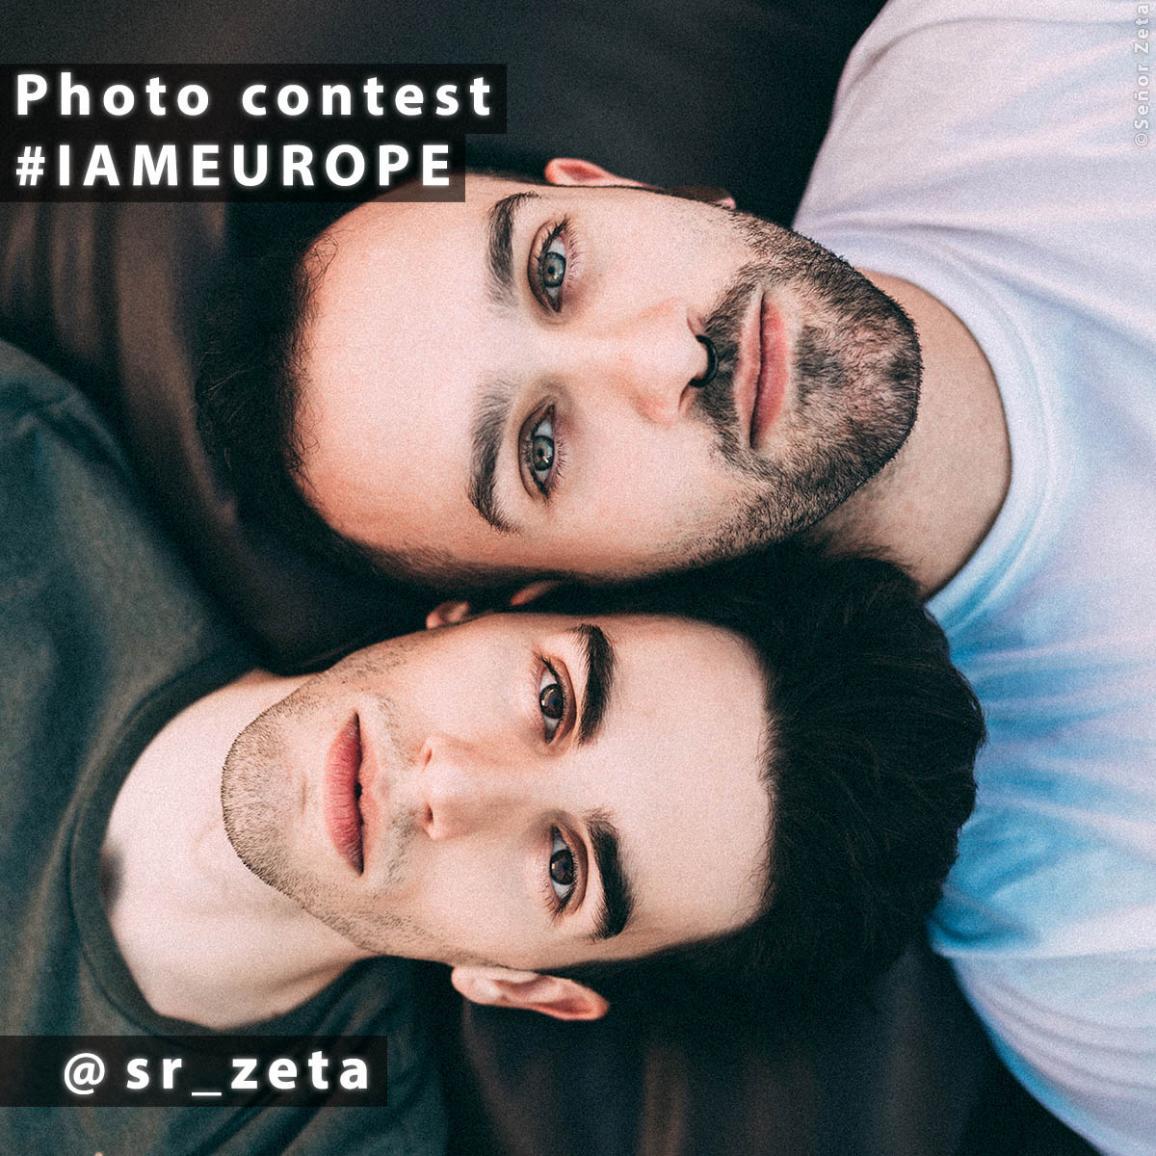 Foto: Muchas gracias al fotógrafo español, (instagram @sr_zeta) por dar su testimonio en el concurso.